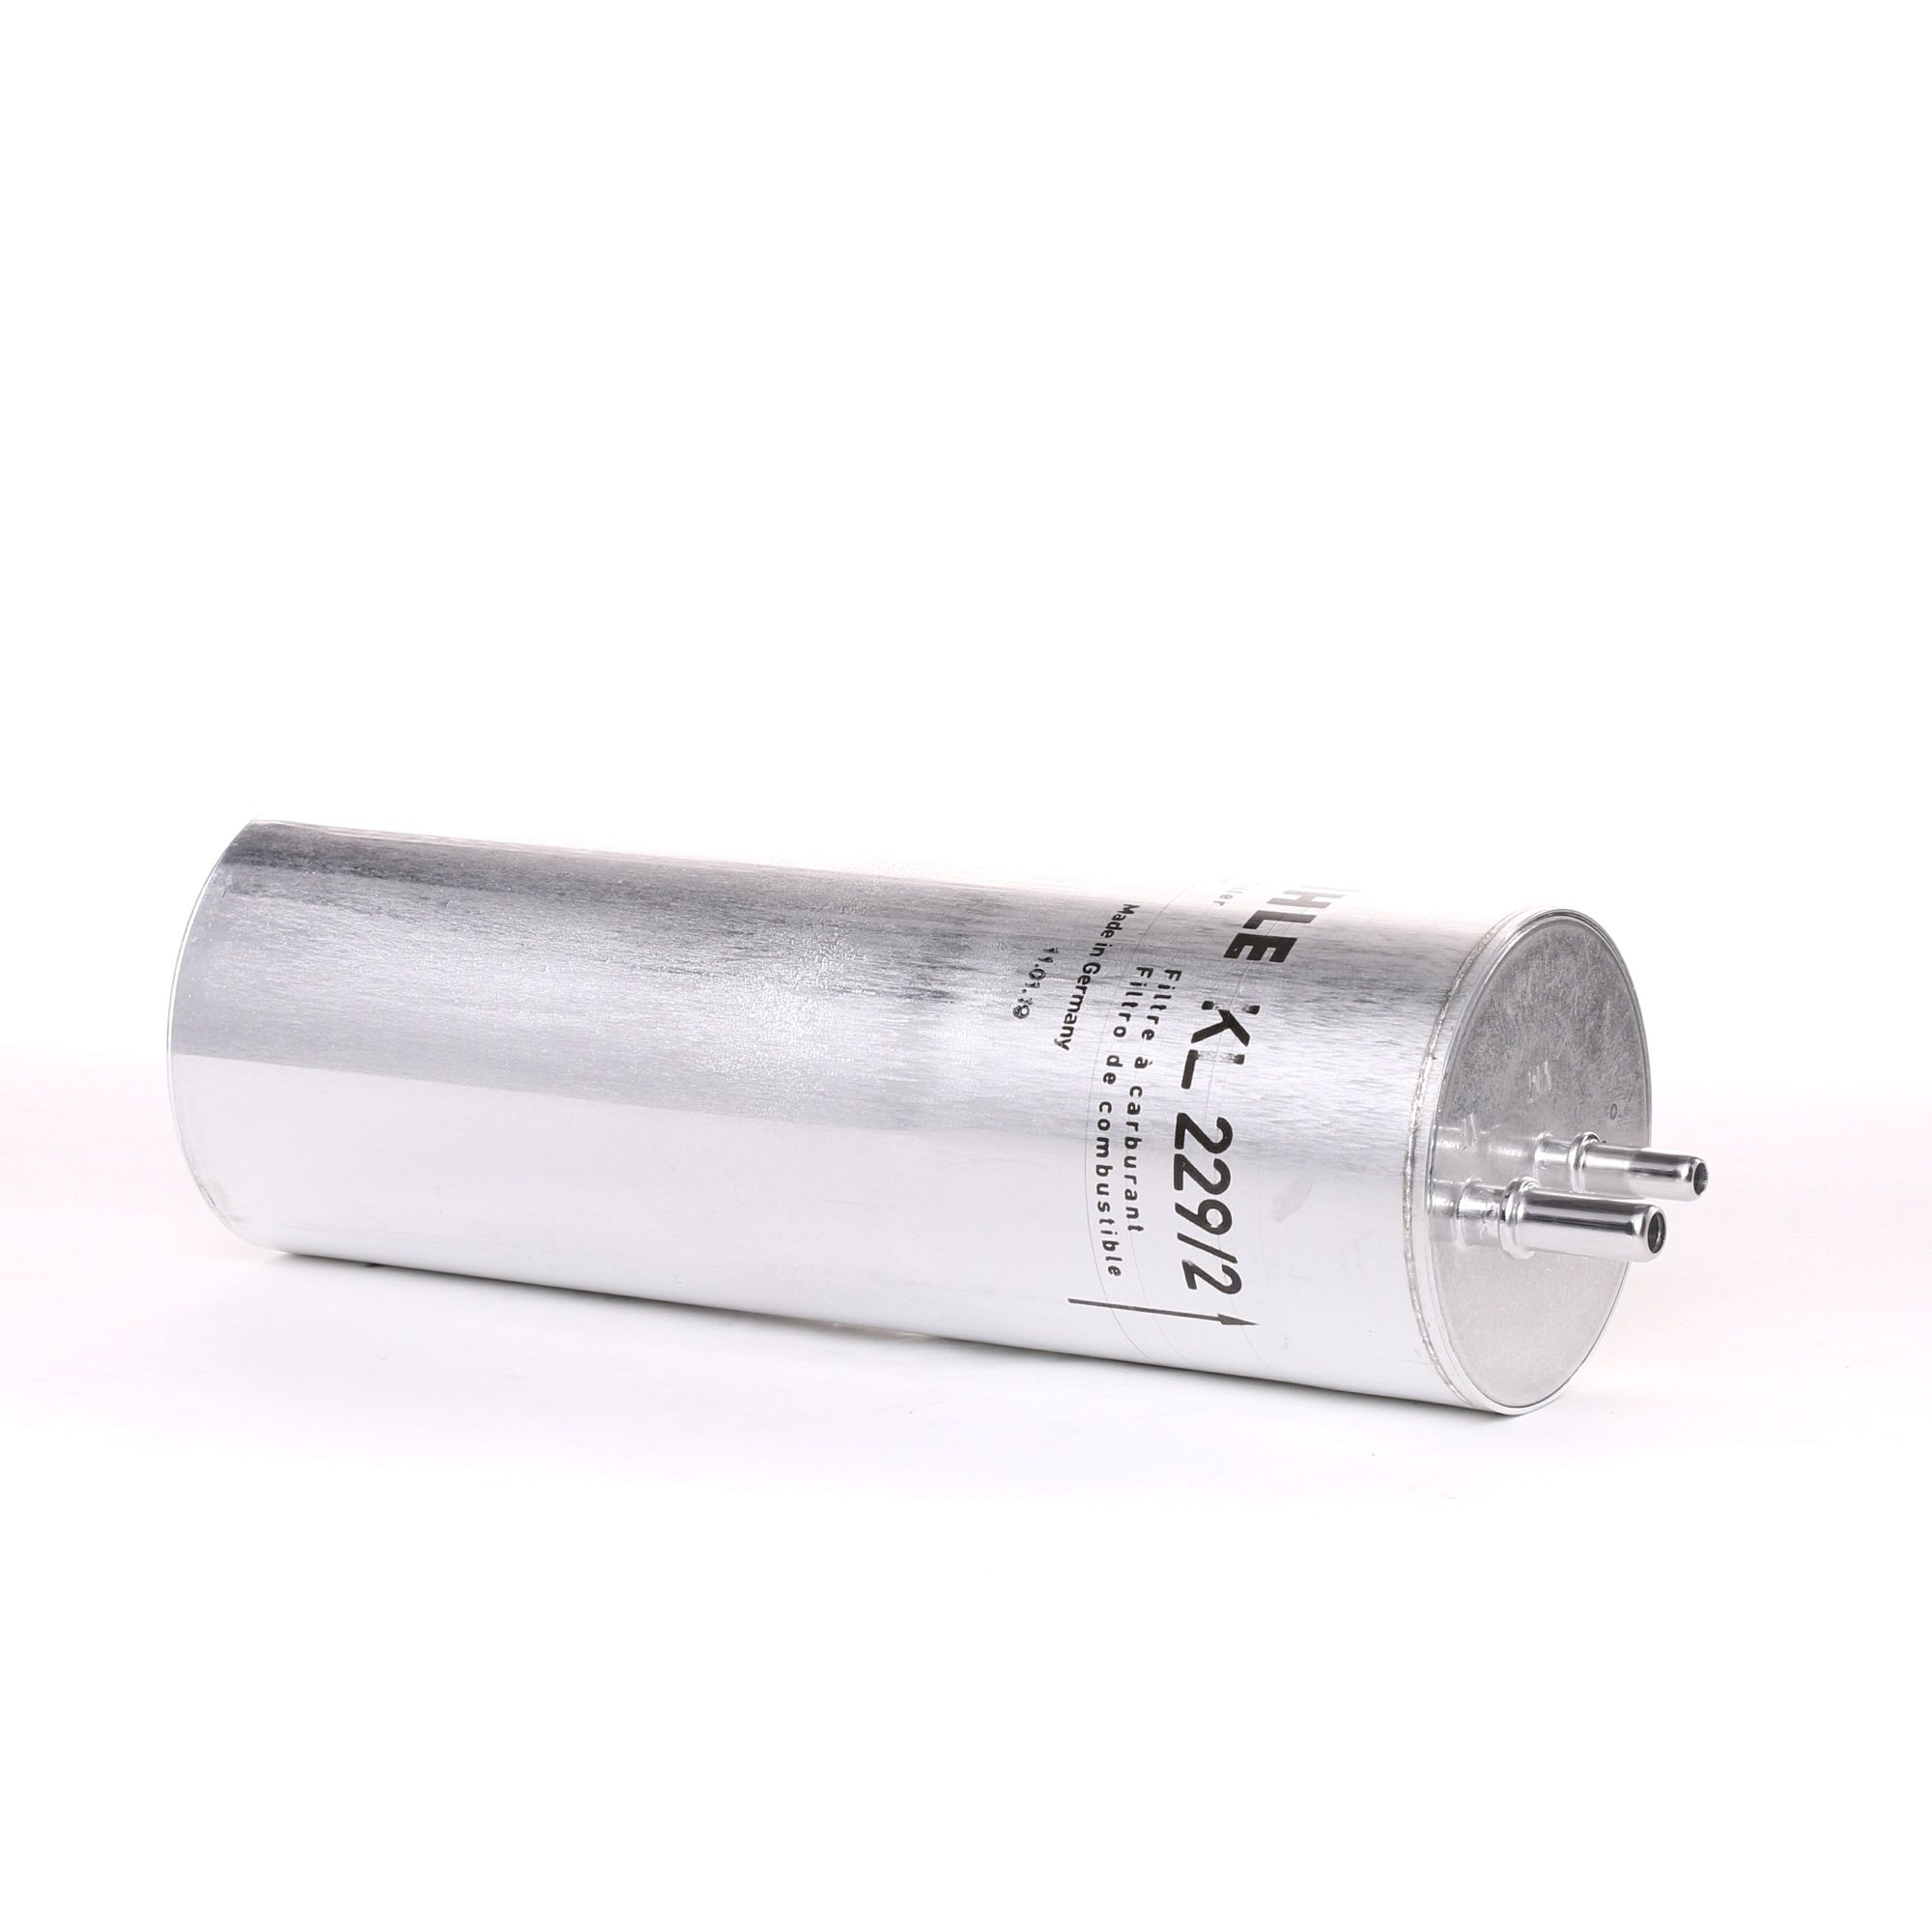 Mahle Filter KL182 Filtro De Combustible